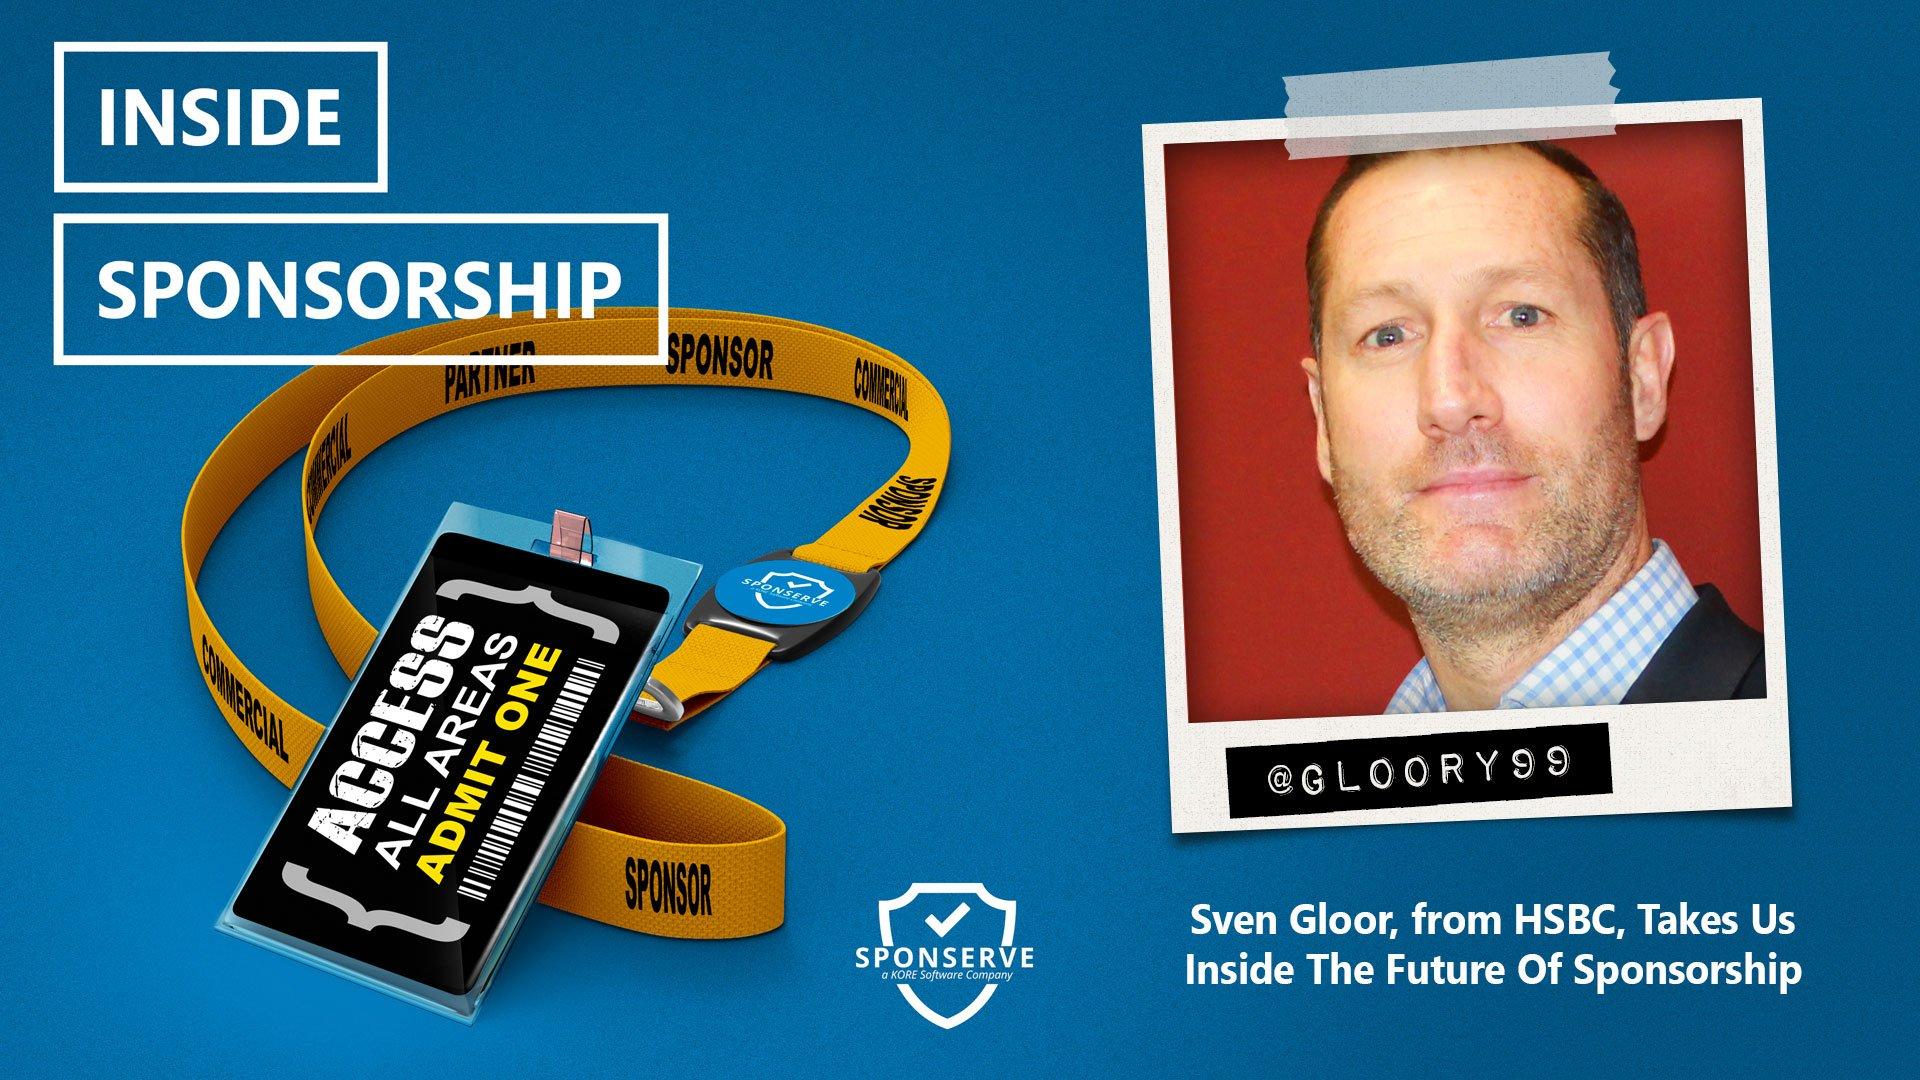 Inside-Sponsorship-Sven-Gloor-HSBC-Future-Sponsorship